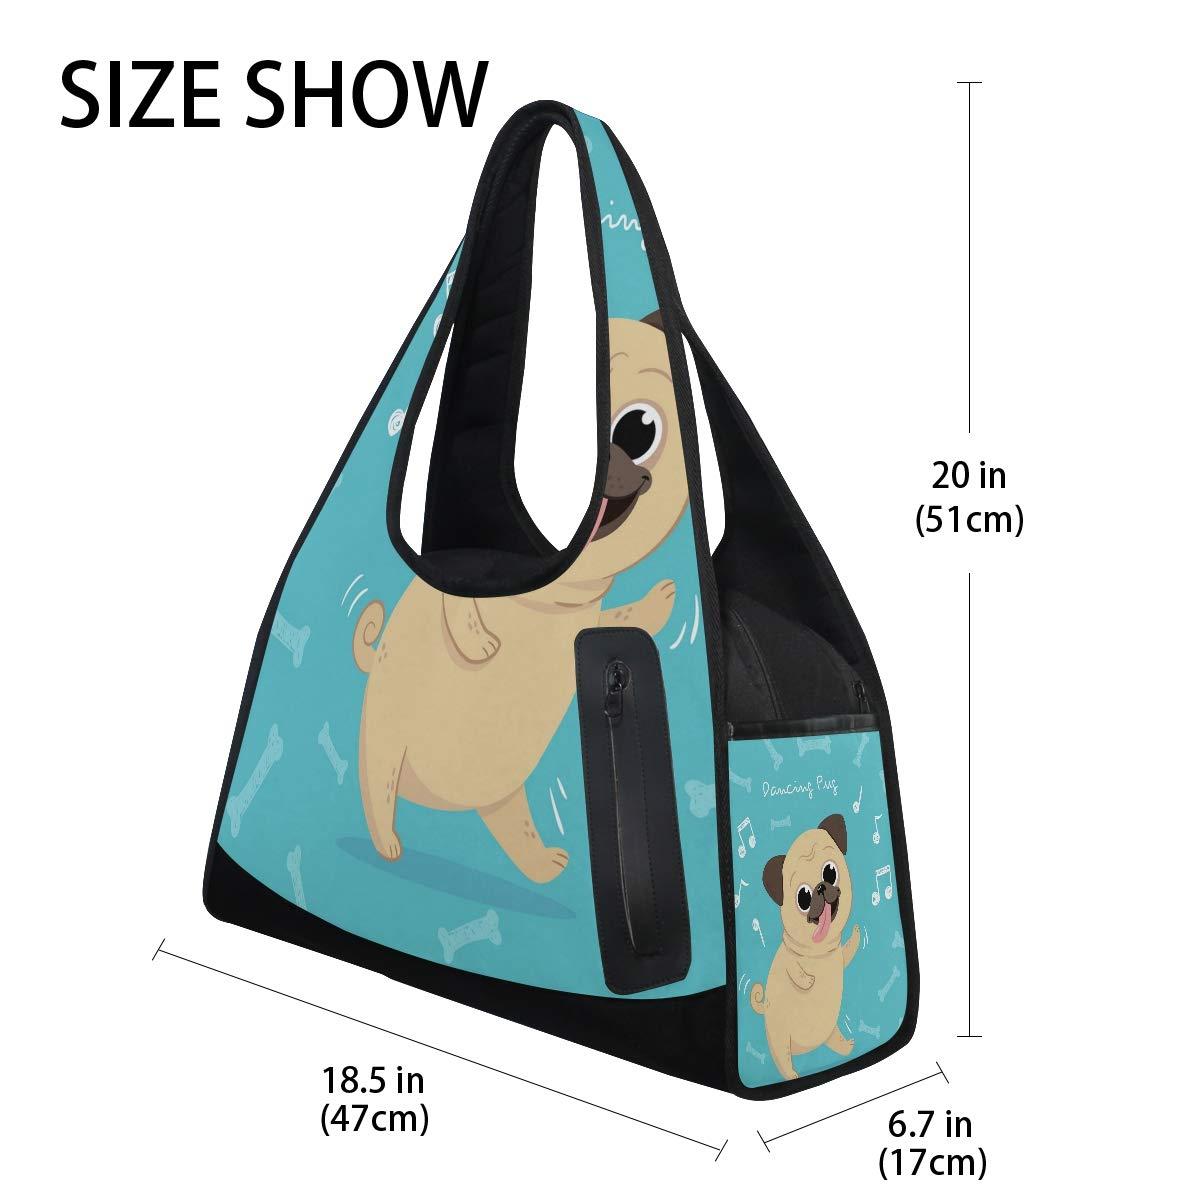 Pug Dancing Women Sports Gym Totes Bag Multi-Function Nylon Travel Shoulder Bag